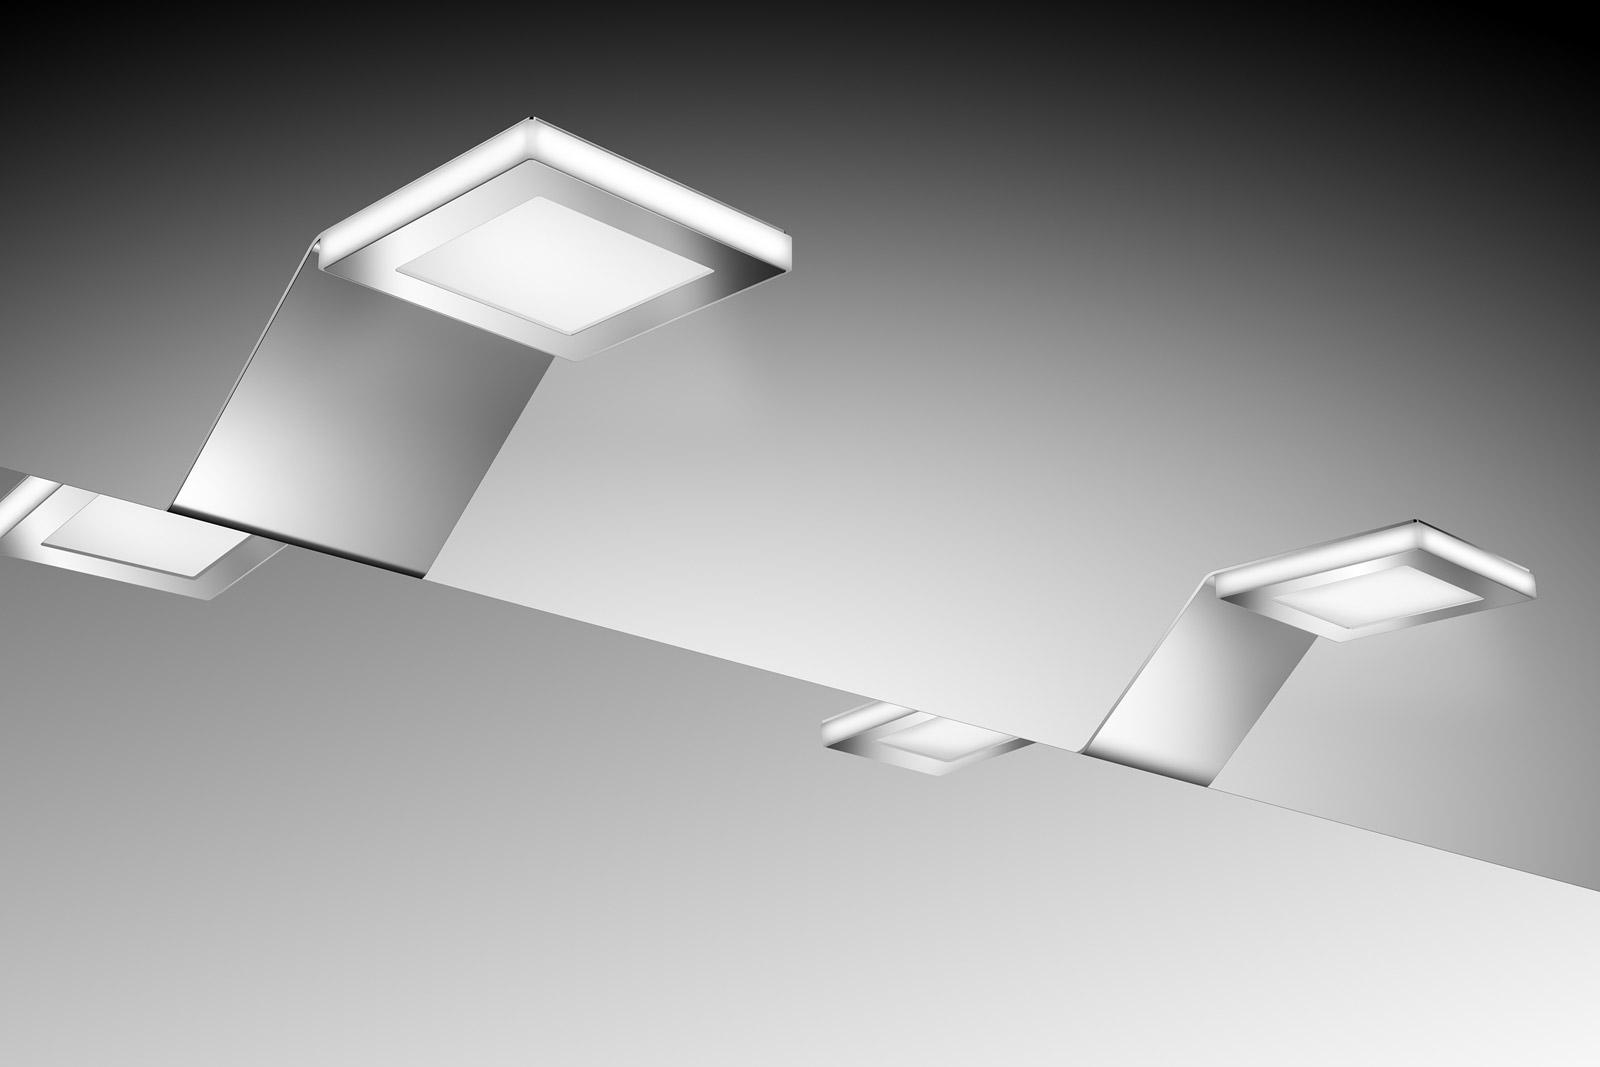 Badezimmer Spiegelschrank Beleuchtung LED 20er Set